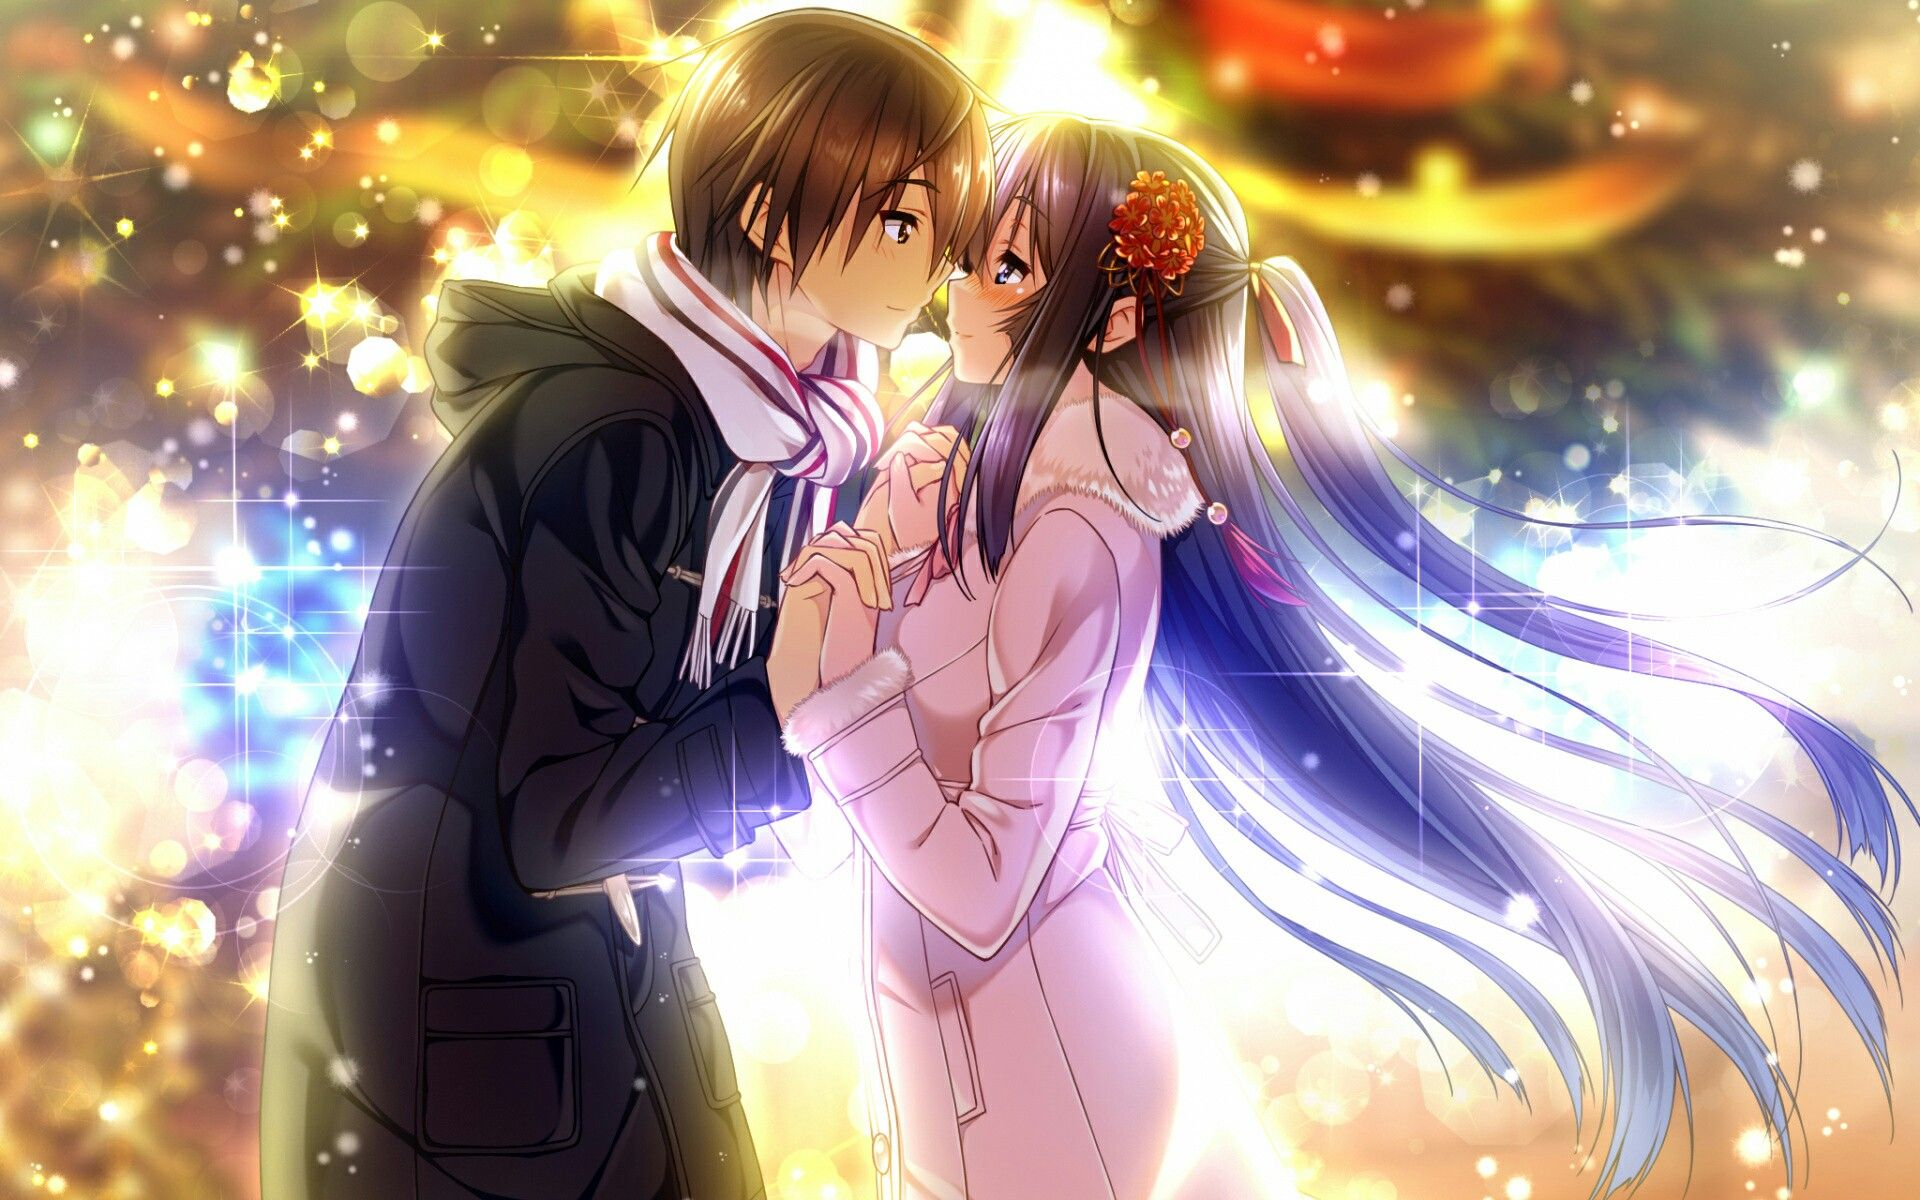 Картинки на аву любовь аниме